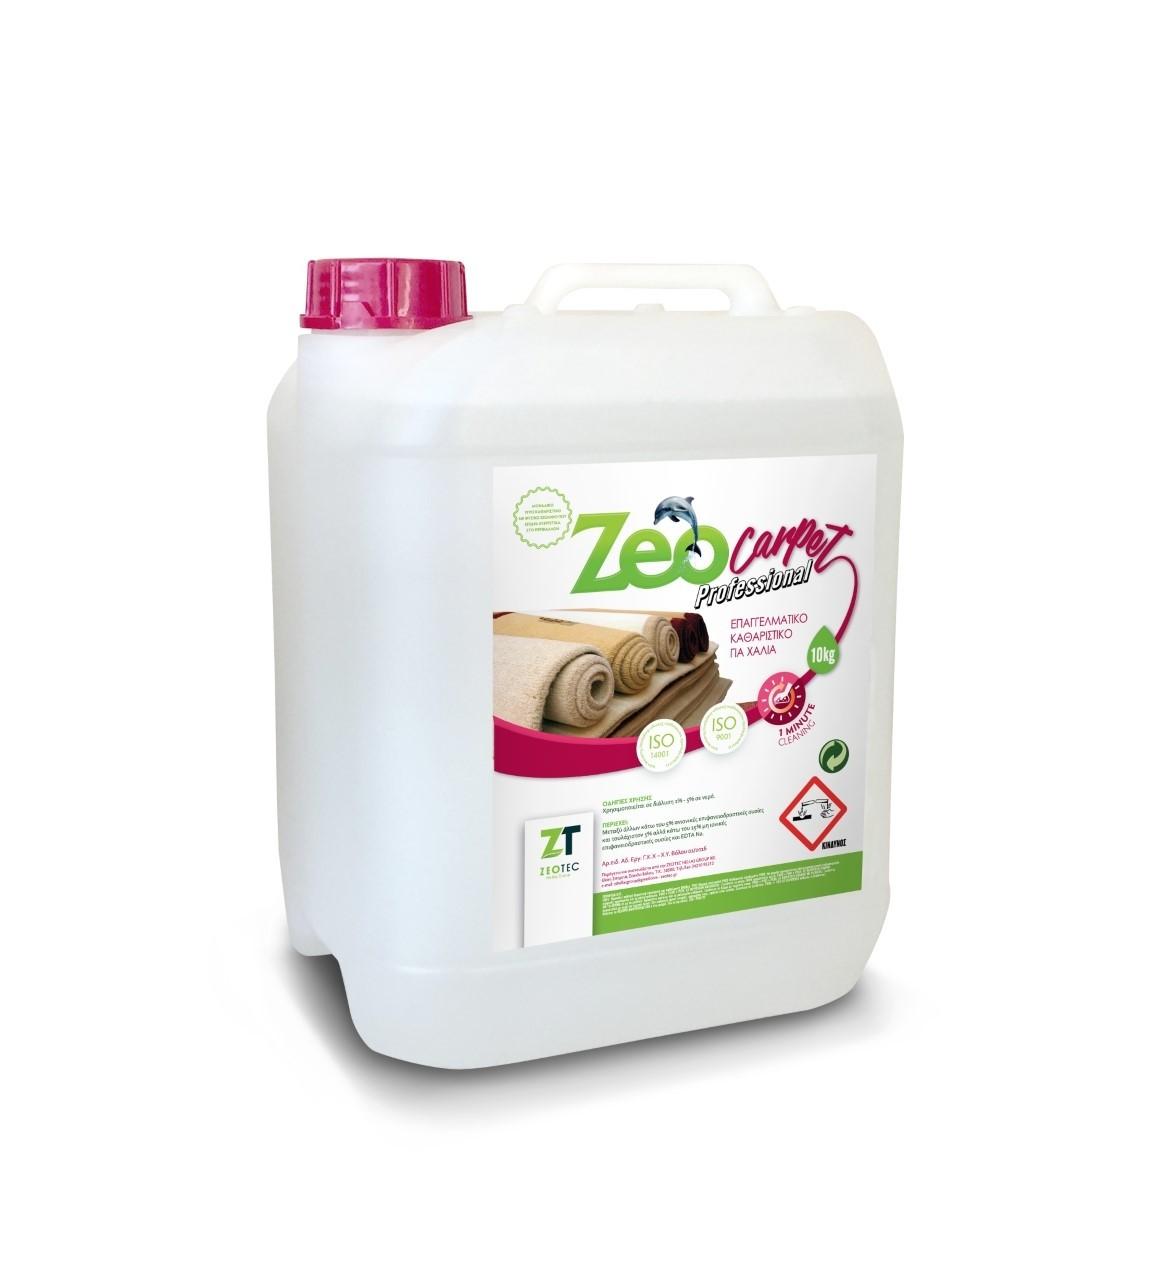 Zeo Carpet Professional - Εξειδικευμένο υγρό απορρυπαντικό για χαλιά και μοκέτες 10lt